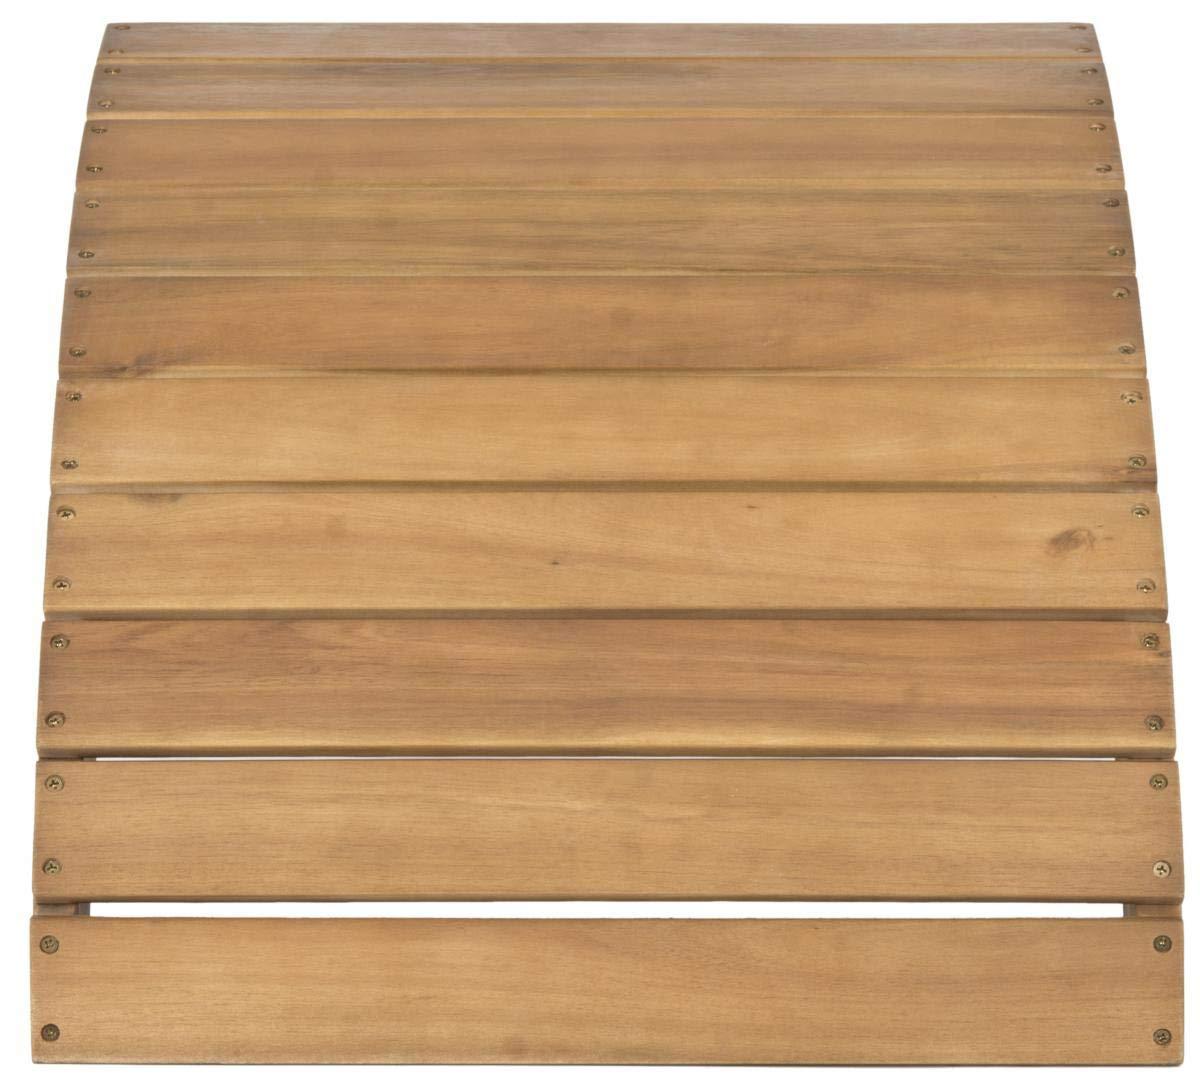 Safavieh Patio Collection Hampton Adirondack Acacia Wood Ottoman, Natural